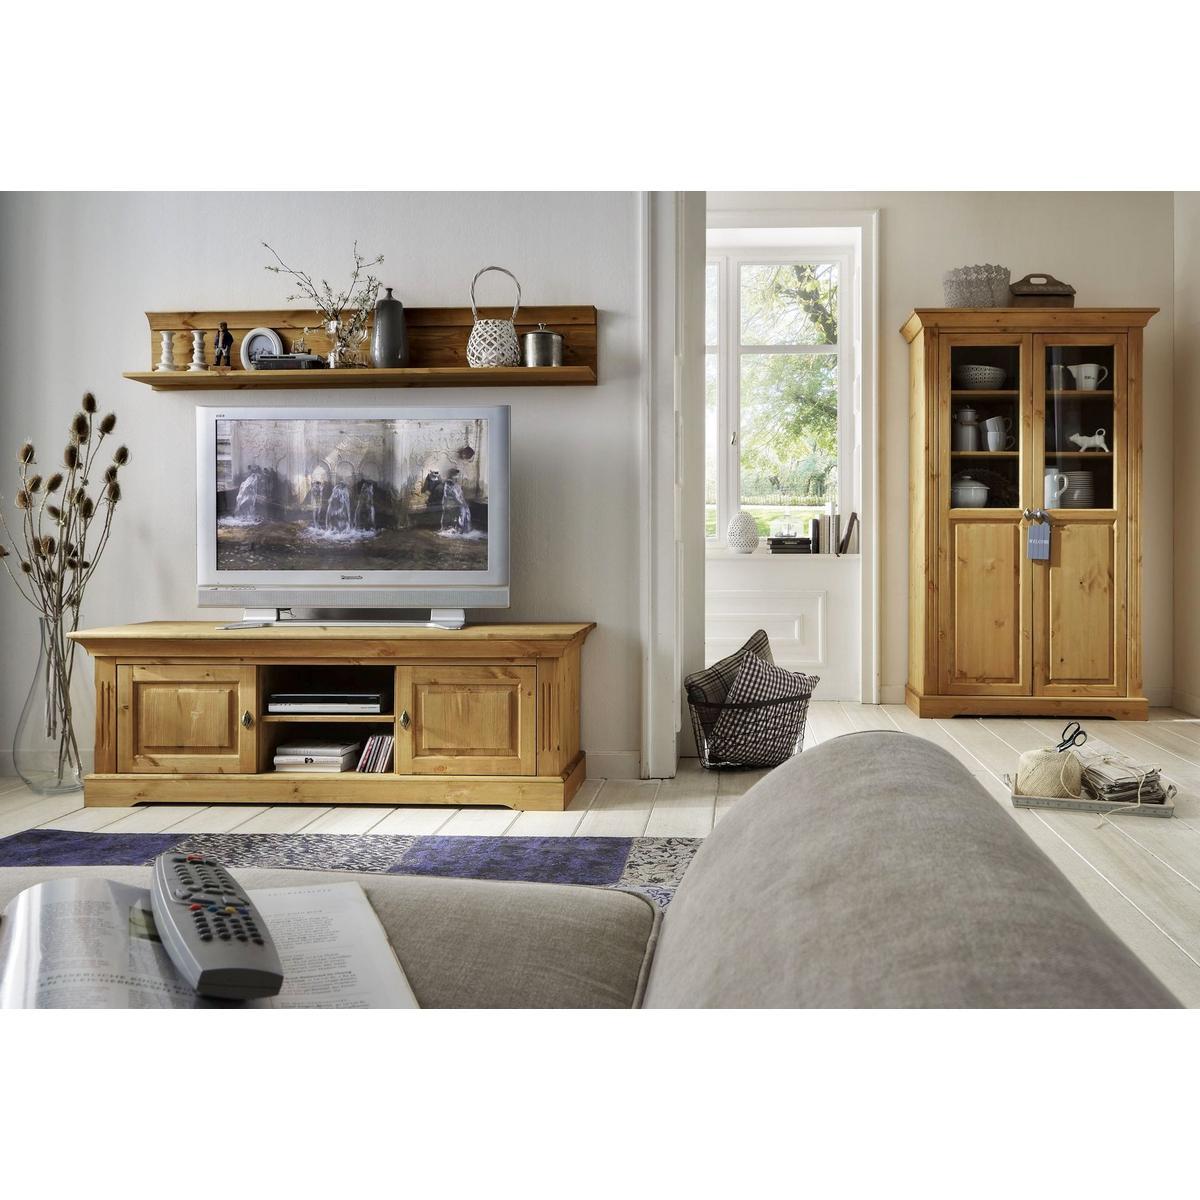 bodenfliesen dunkelgrau. Black Bedroom Furniture Sets. Home Design Ideas